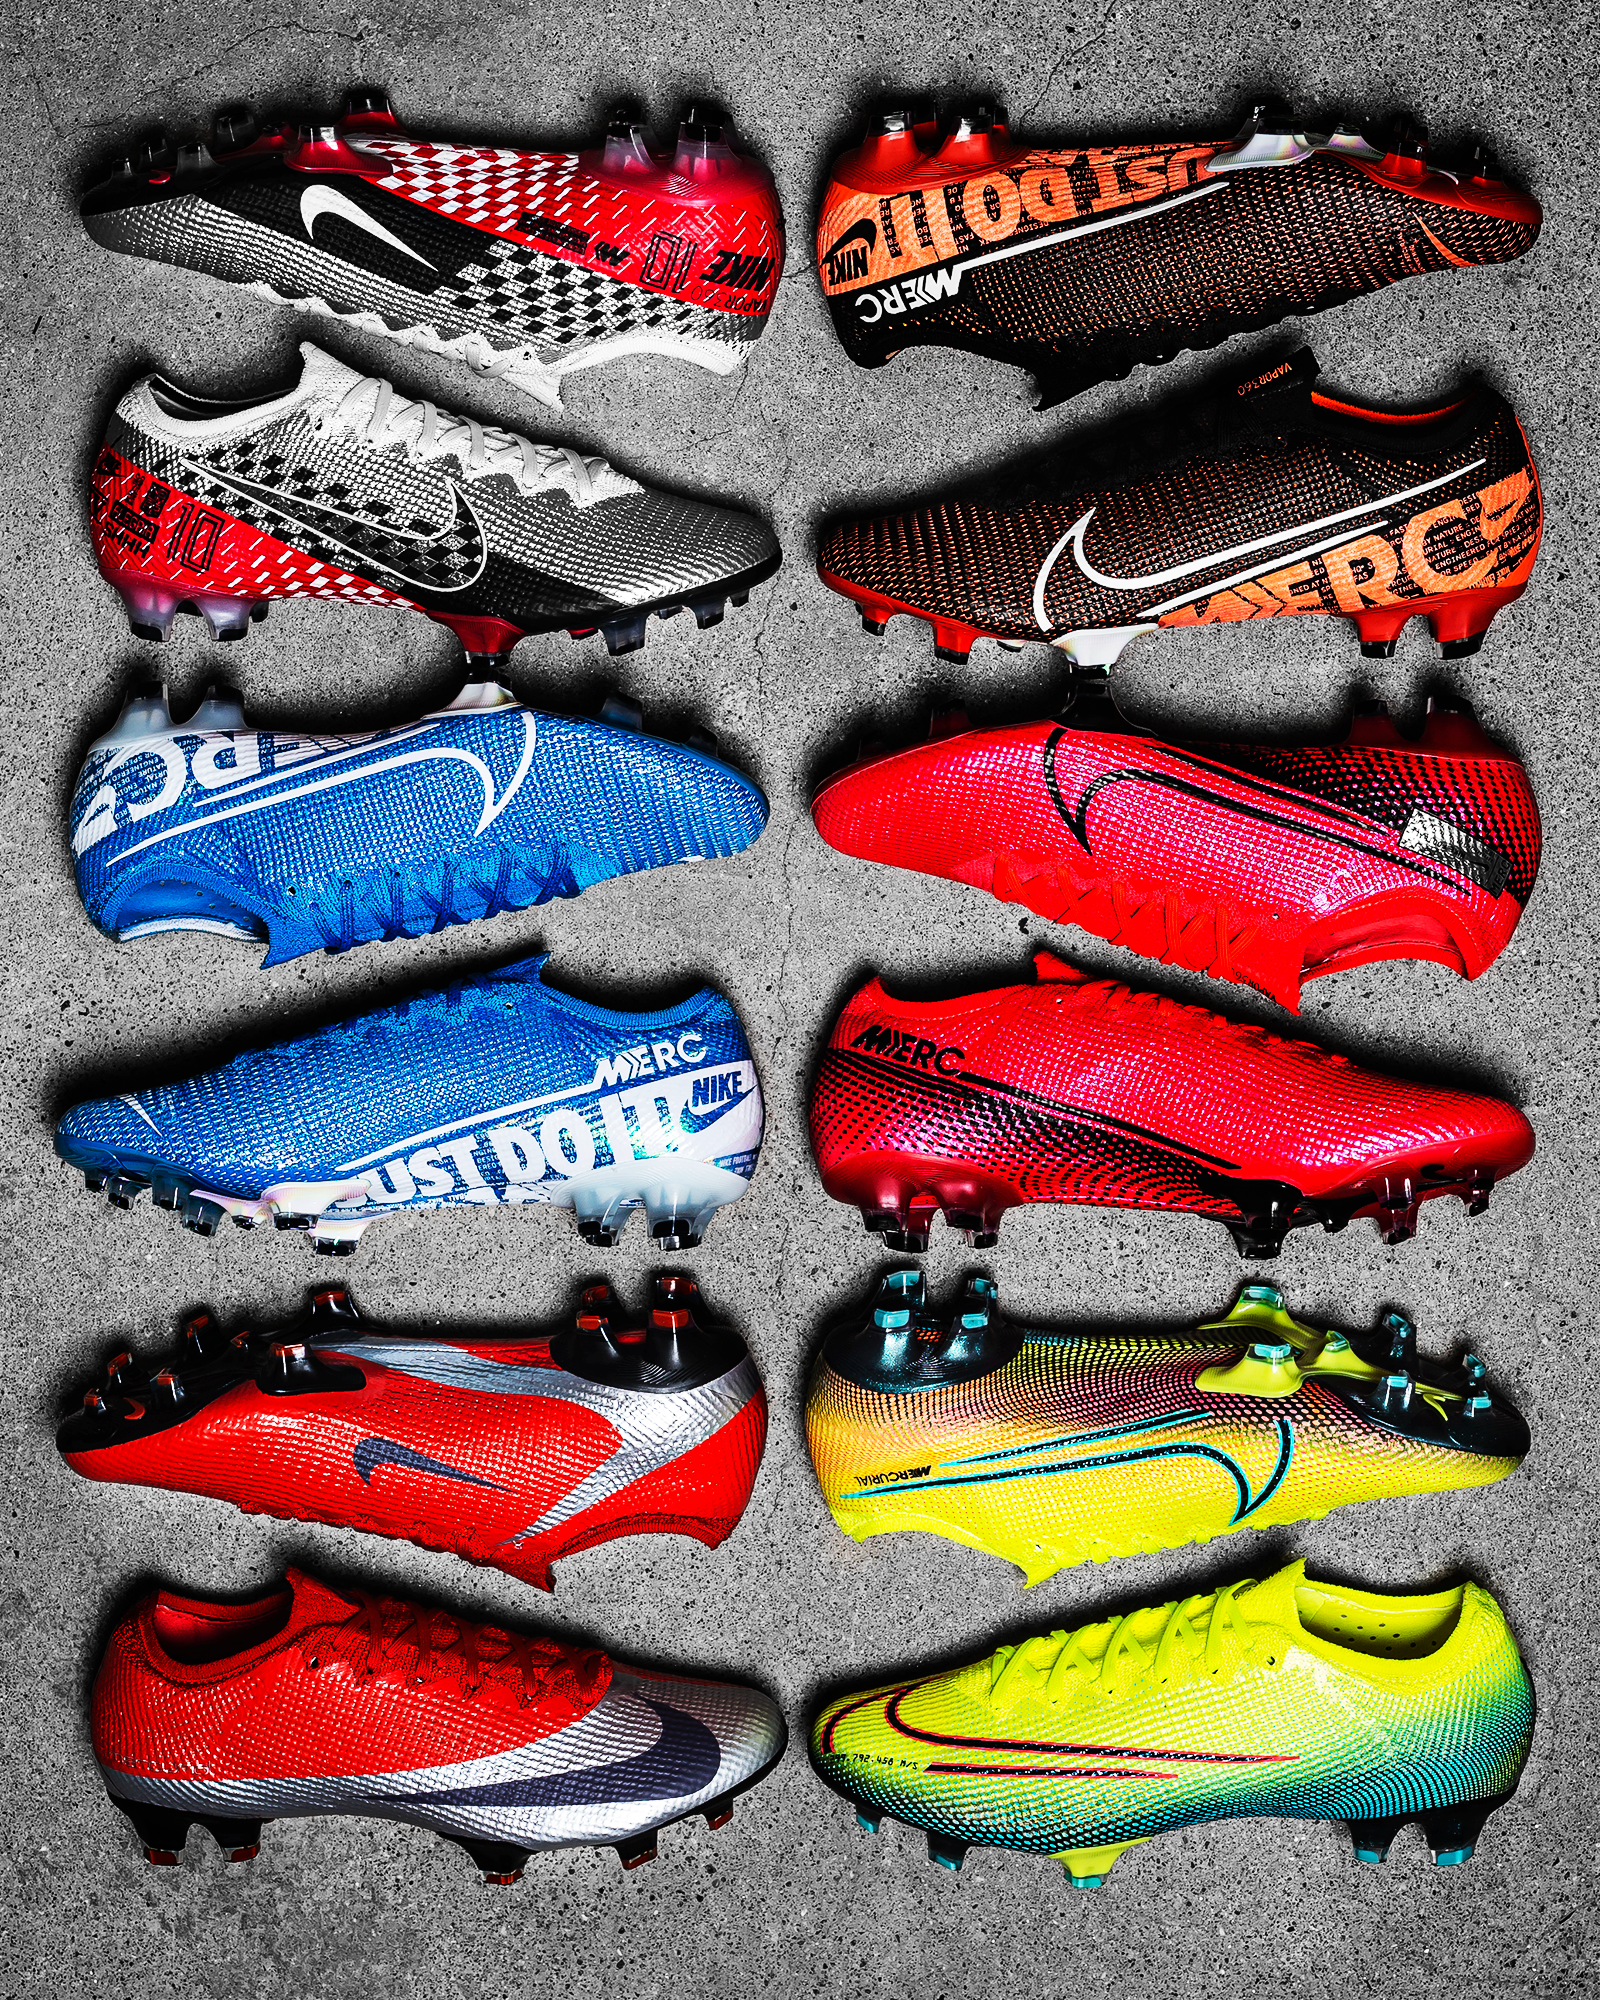 Vapor 13 Meeting In 2020 Nike Football Boots Football Boots Nike Football